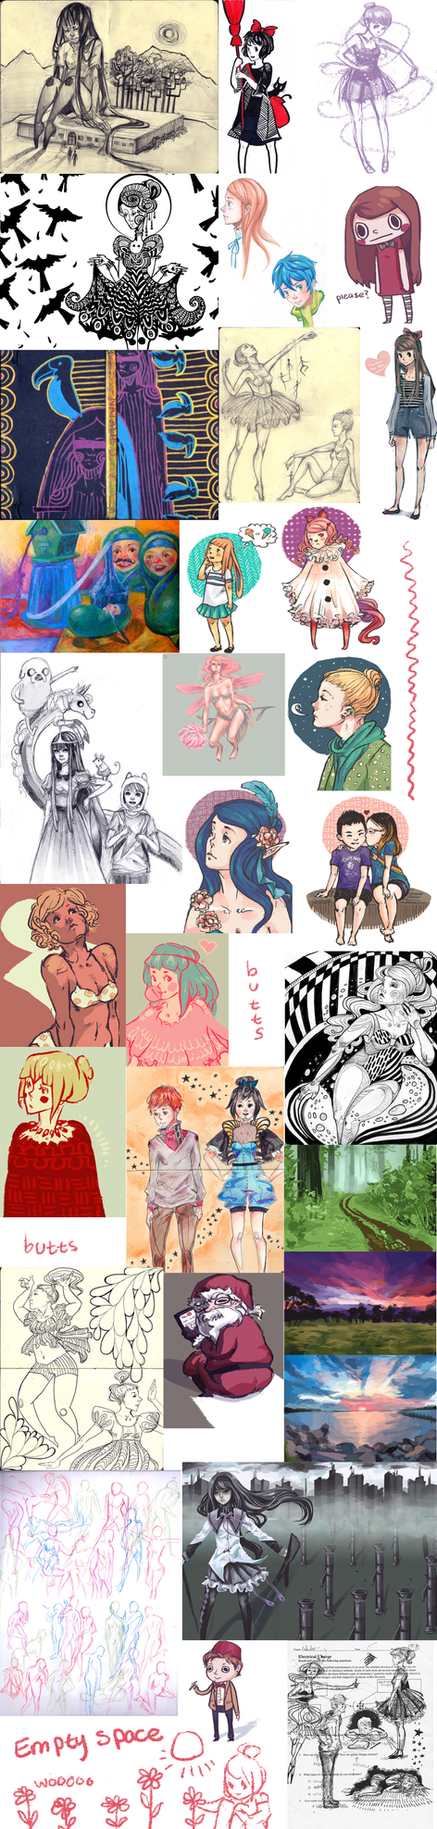 Tumblr Sketchdump by bhakri